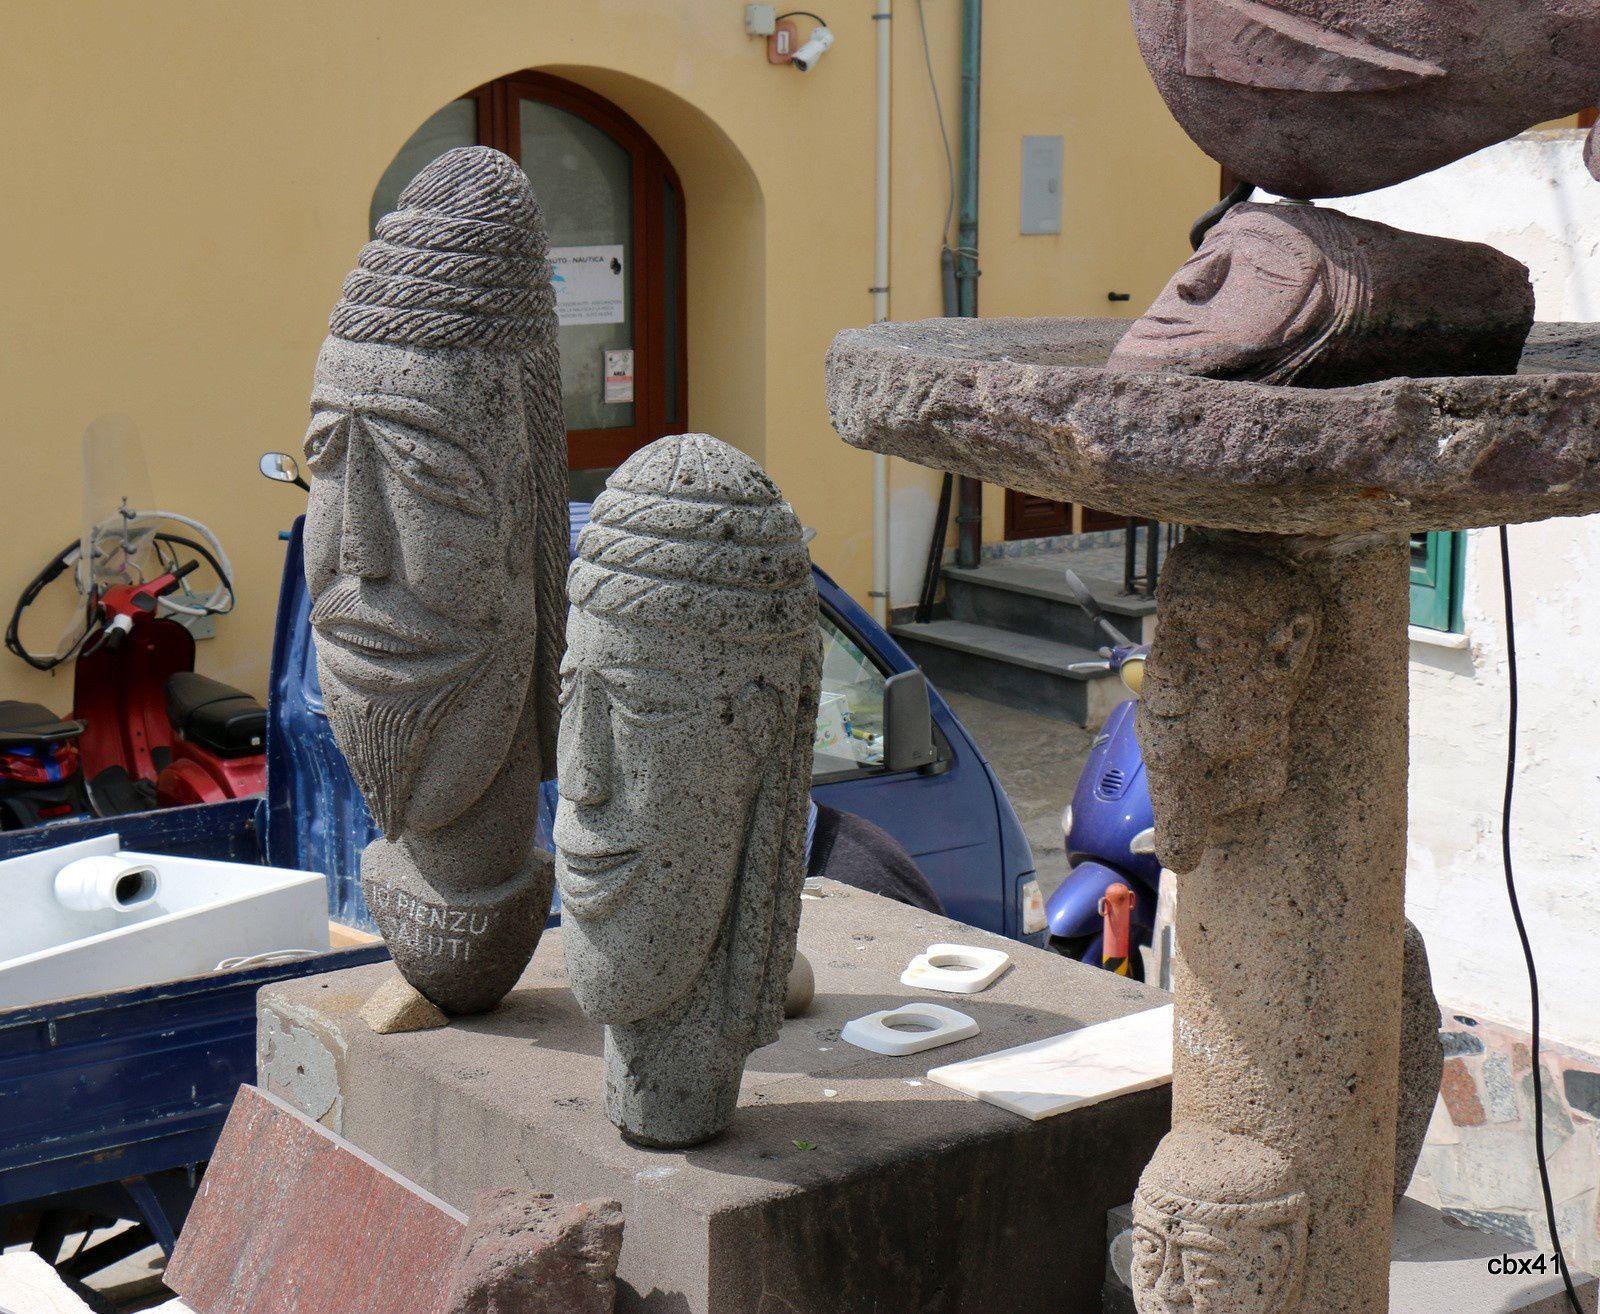 Atelier de sculpture à Lipari (1/3)